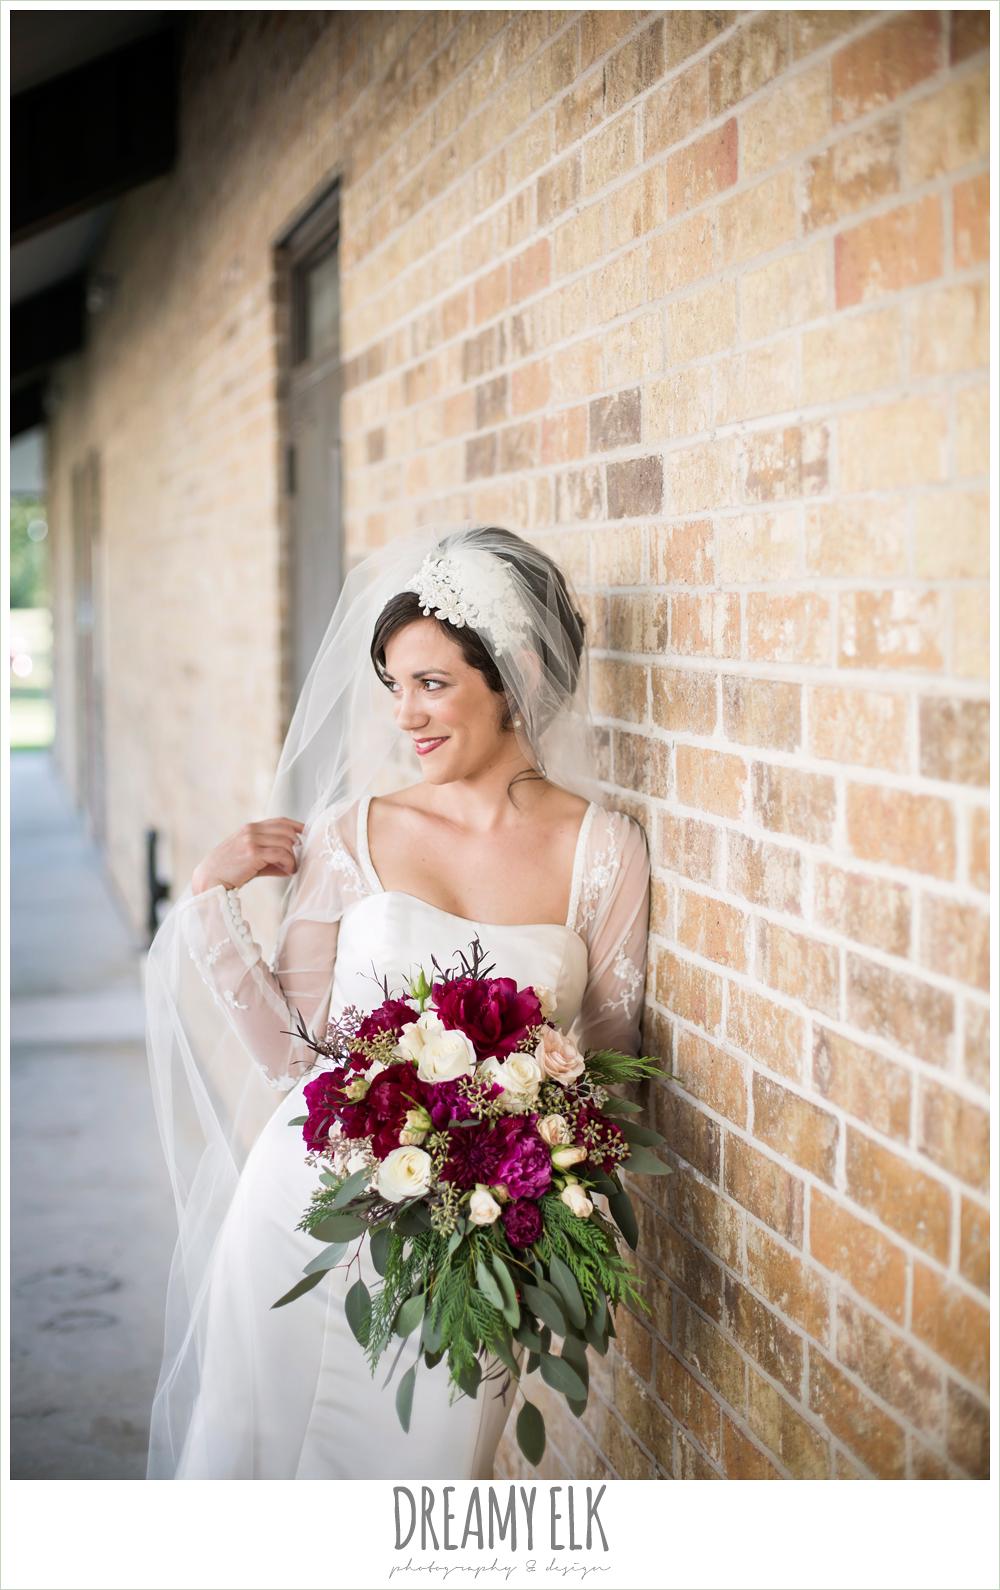 bride, long sleeve wedding dress, winter burgundy wedding bouquet, winter december church wedding photo {dreamy elk photography and design}